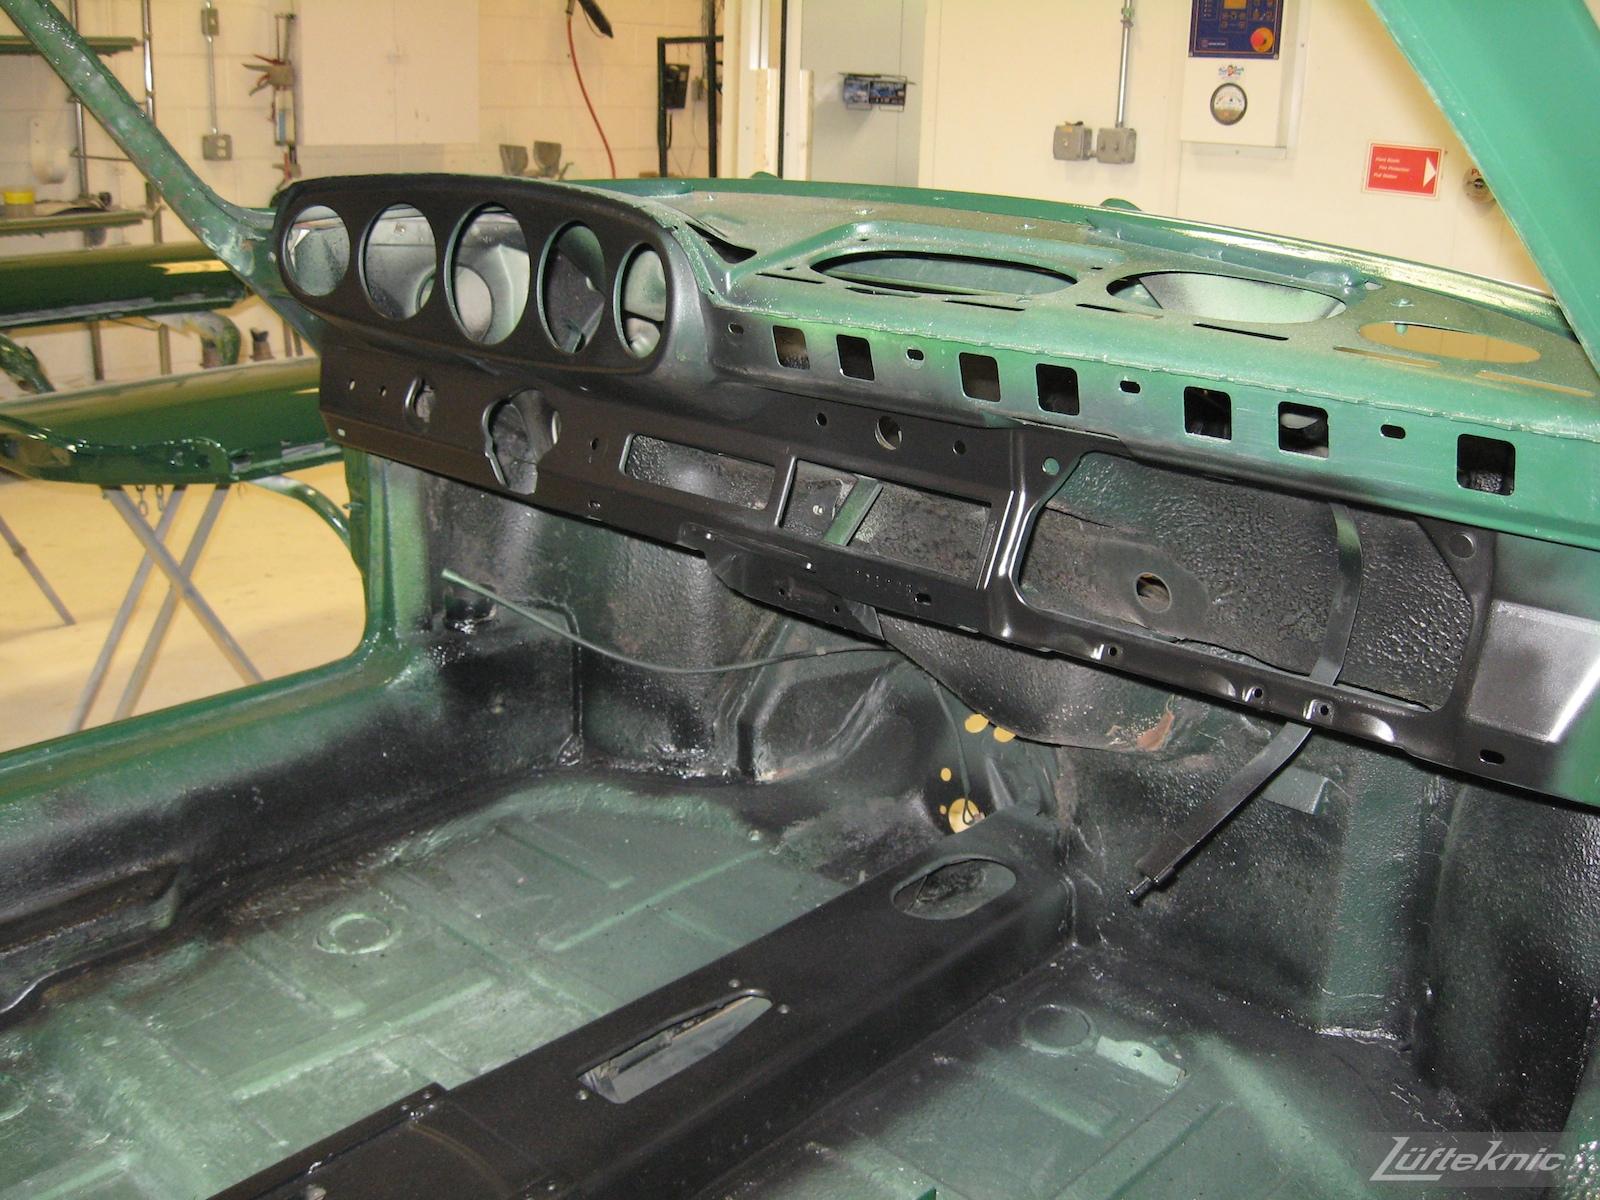 Fresh dash paint and coated floors on an Irish Green Porsche 912 undergoing restoration at Lufteknic.